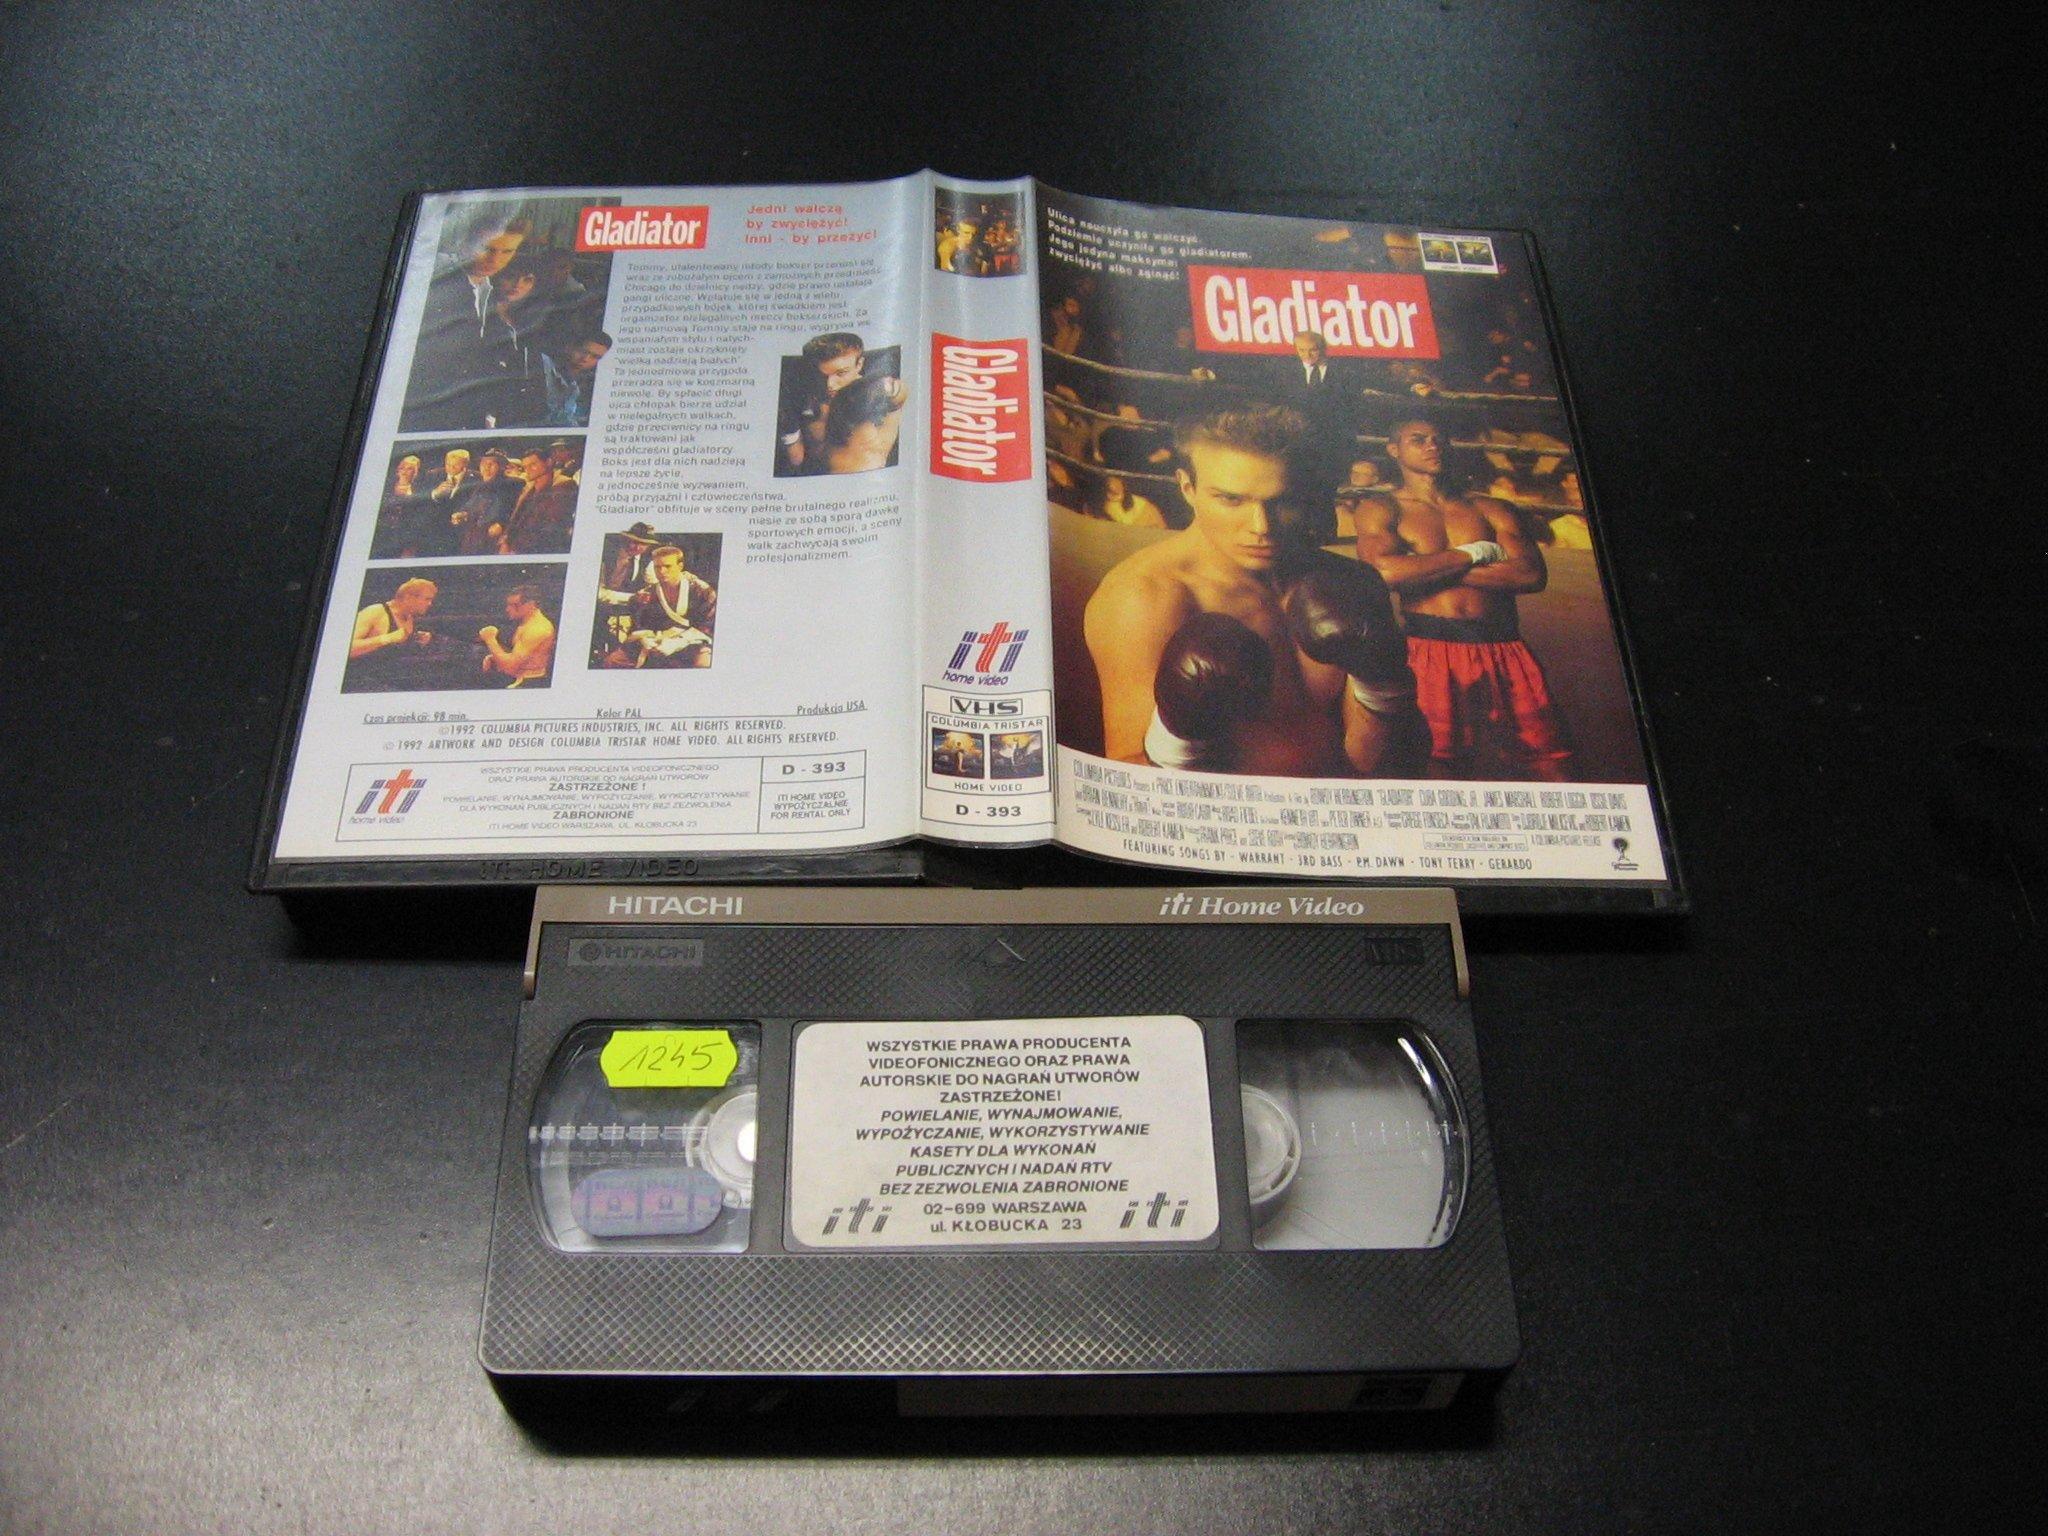 GLADIATOR -  kaseta VHS - 0988 Opole - AlleOpole.pl